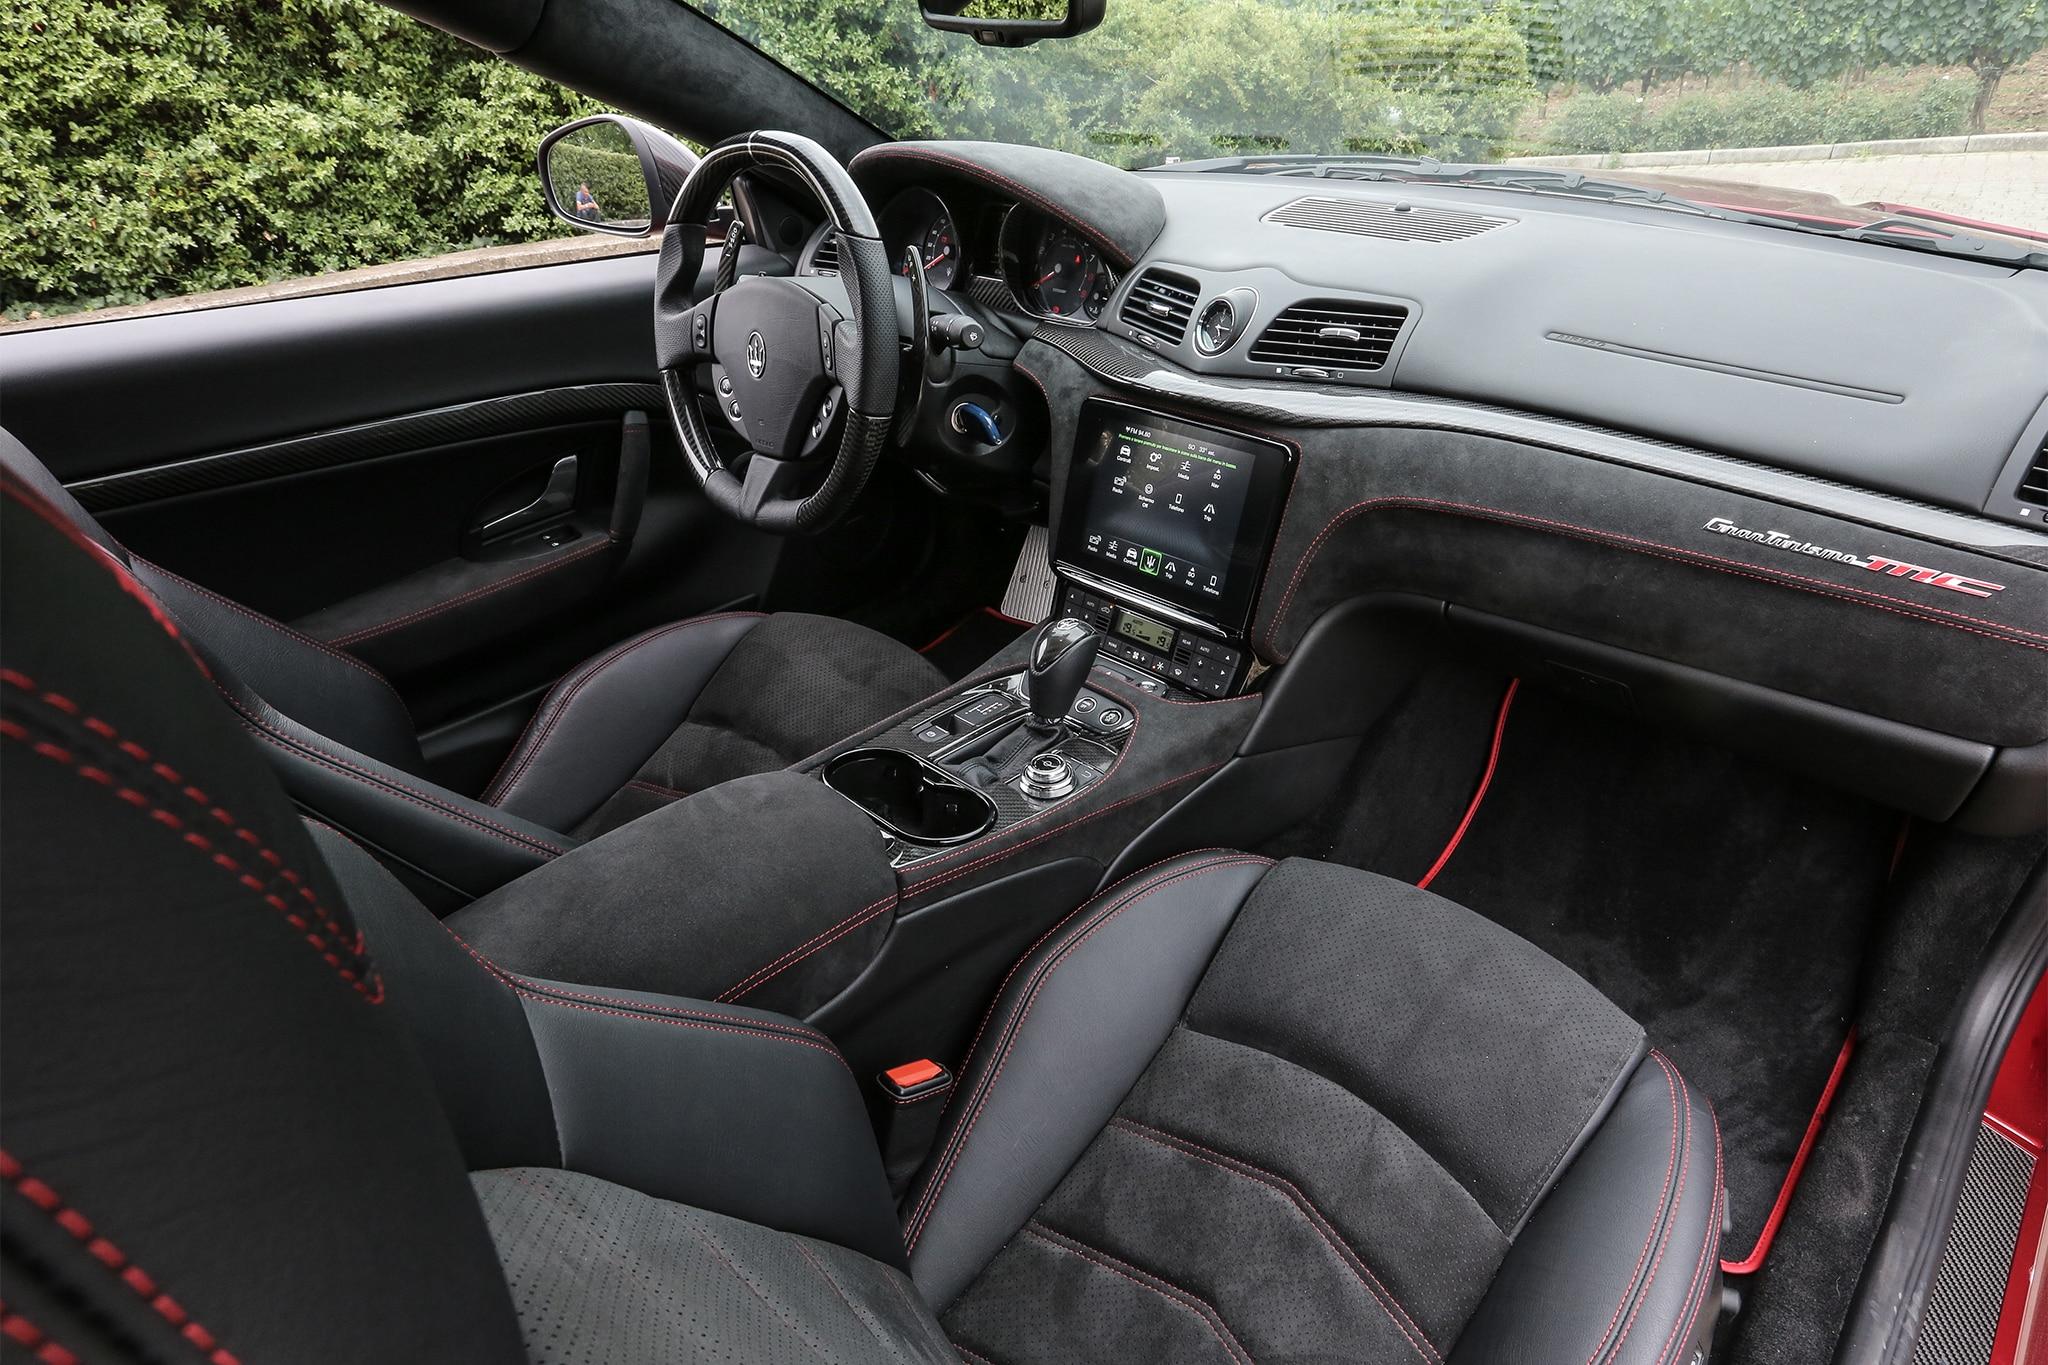 http://st.automobilemag.com/uploads/sites/11/2017/07/2018-Maserati-GranTurismo-cabin-02.jpg